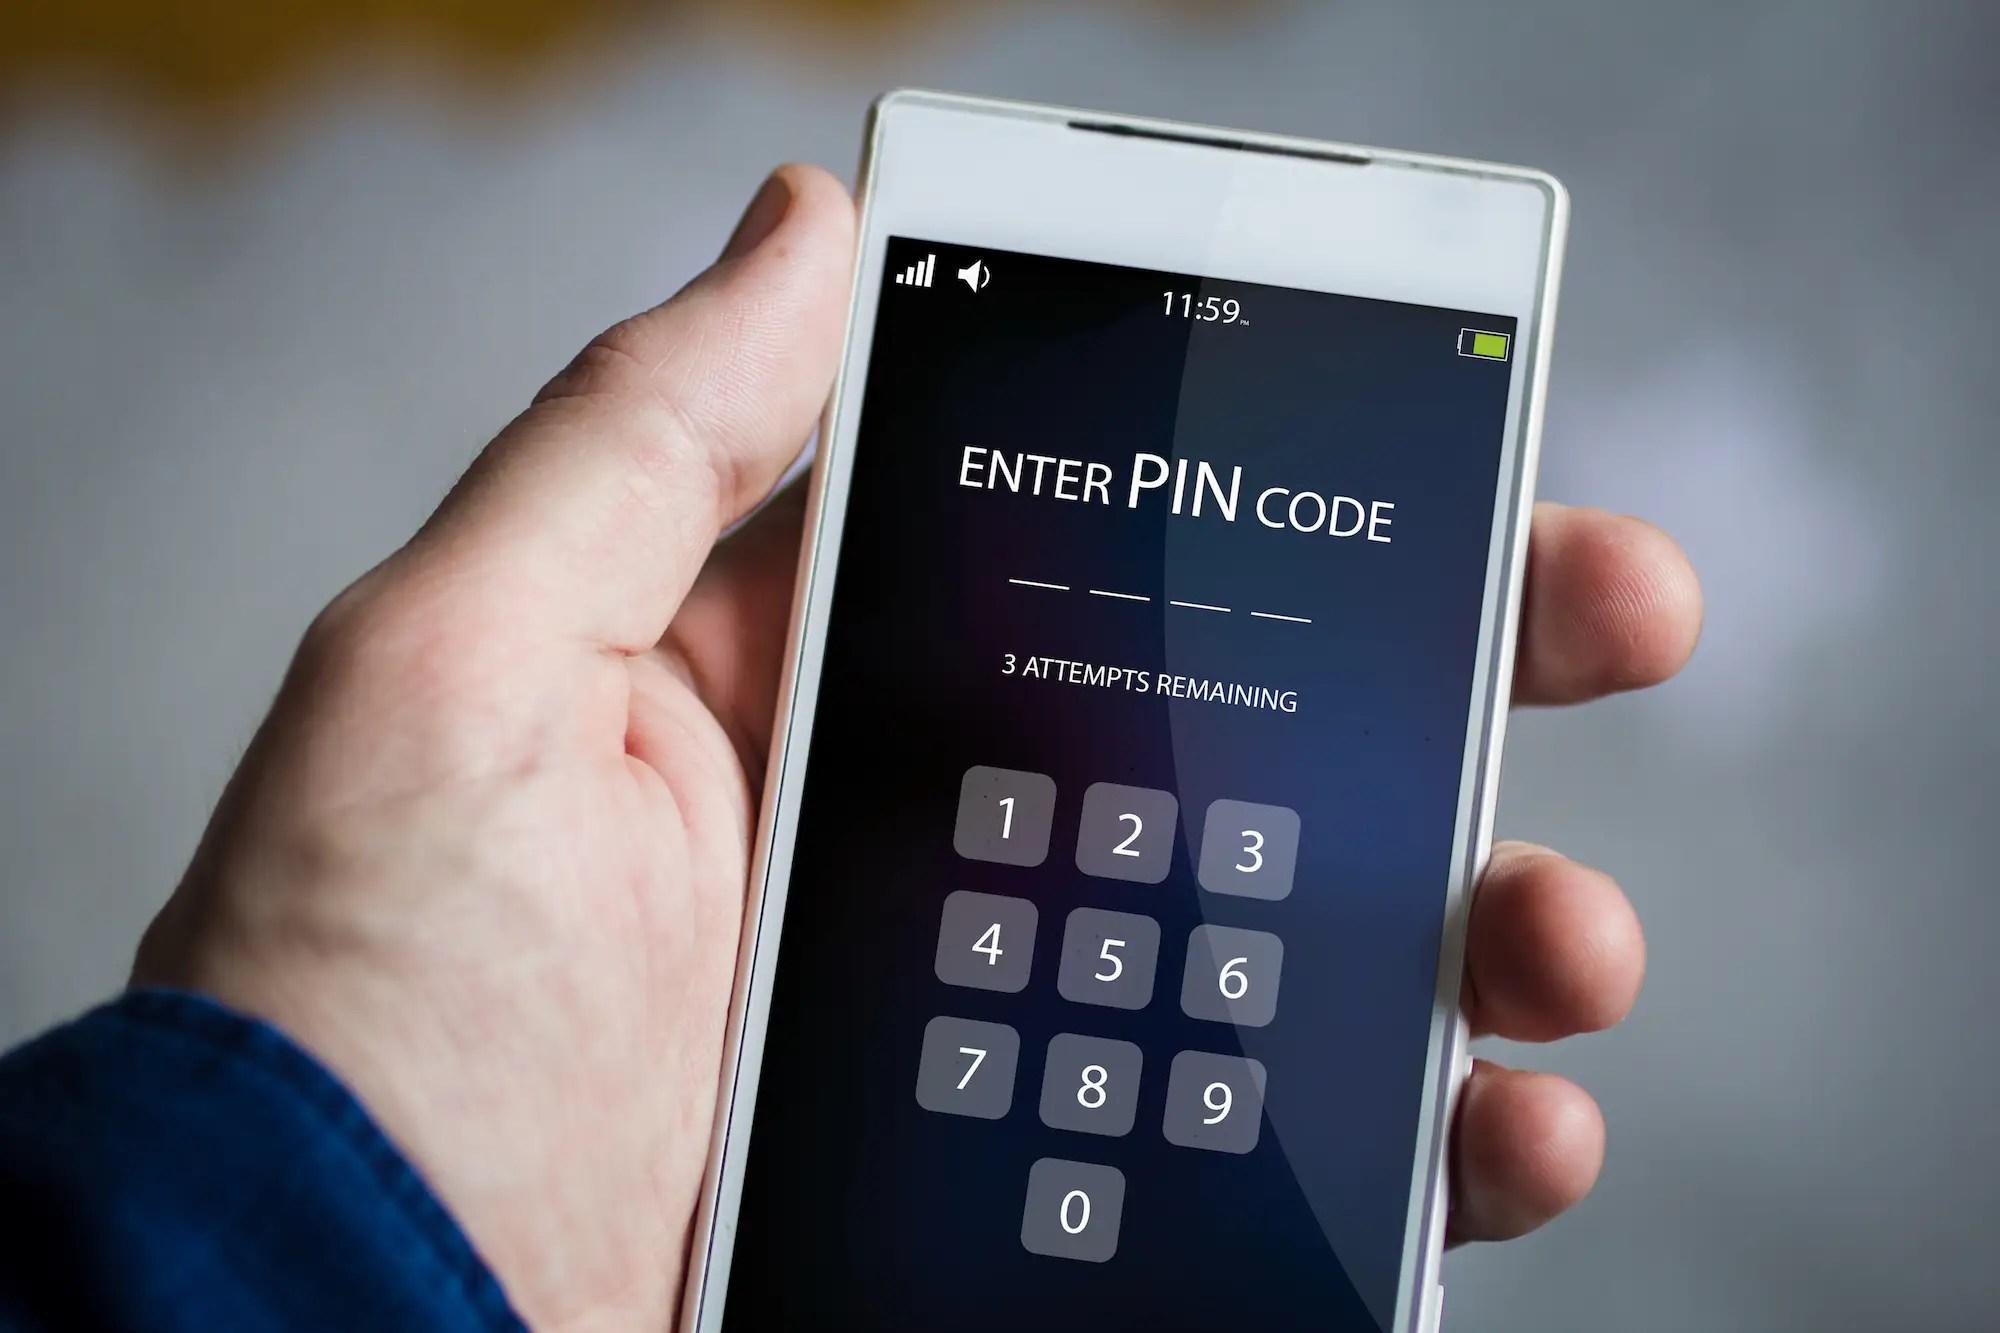 locked phone unlock pin code password